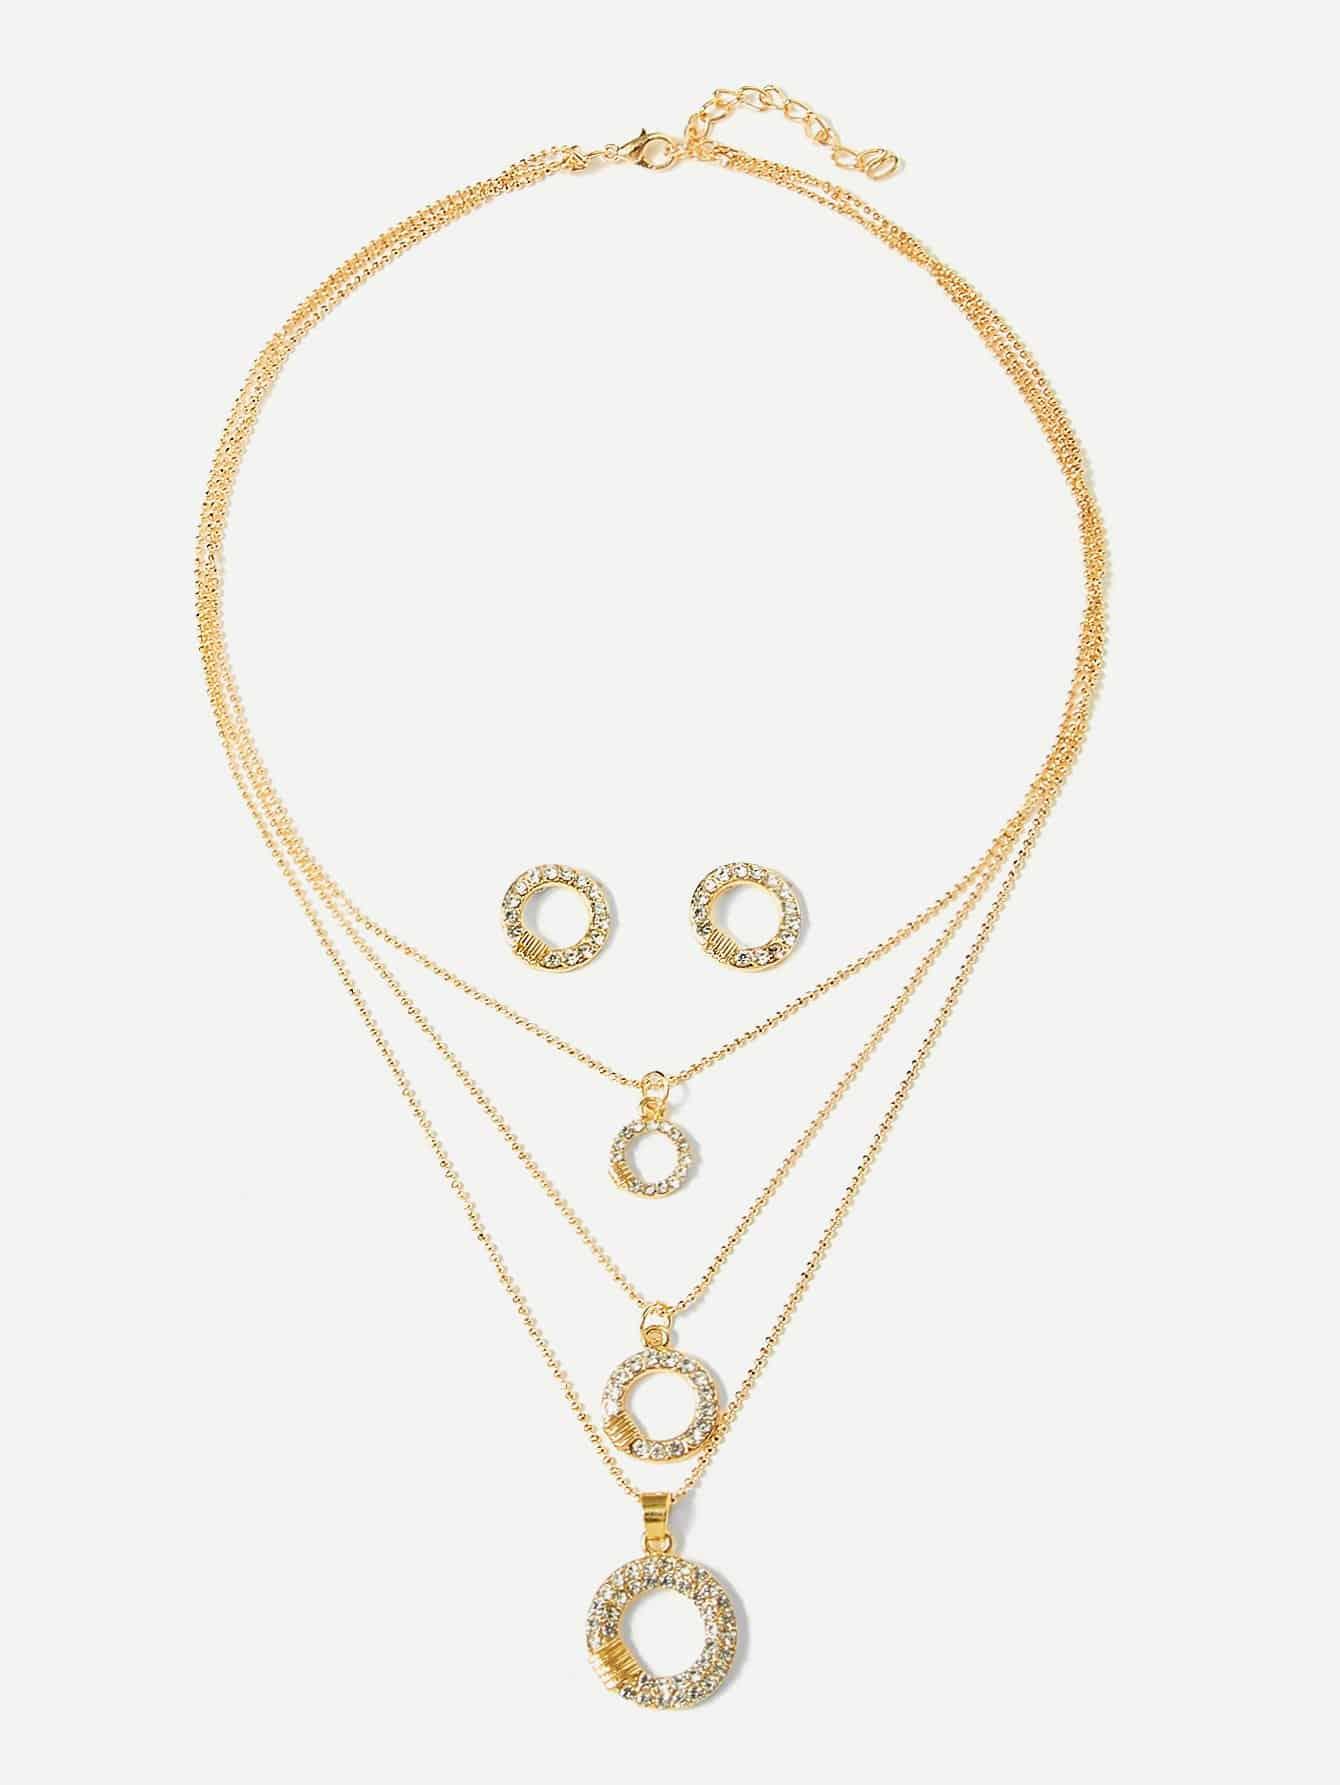 Купить Круг Слоистых Кулон Ожерелье & Серьги, null, SheIn